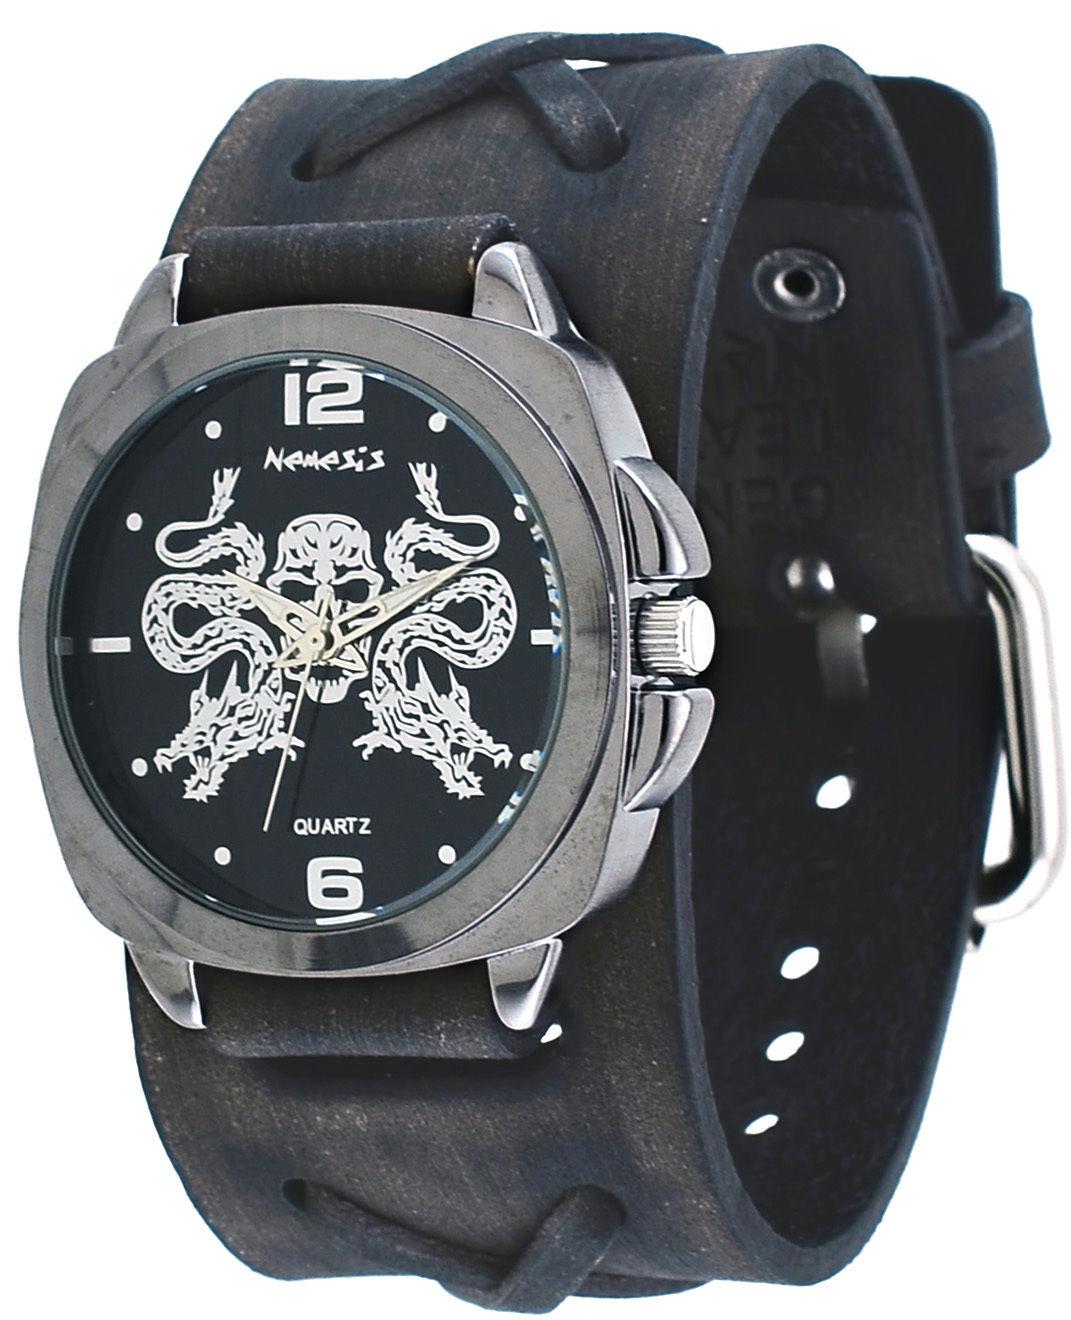 Nemesis KFXB910K Men's Serpent Skull Emblem X Cross Wide Leather Band Watch by